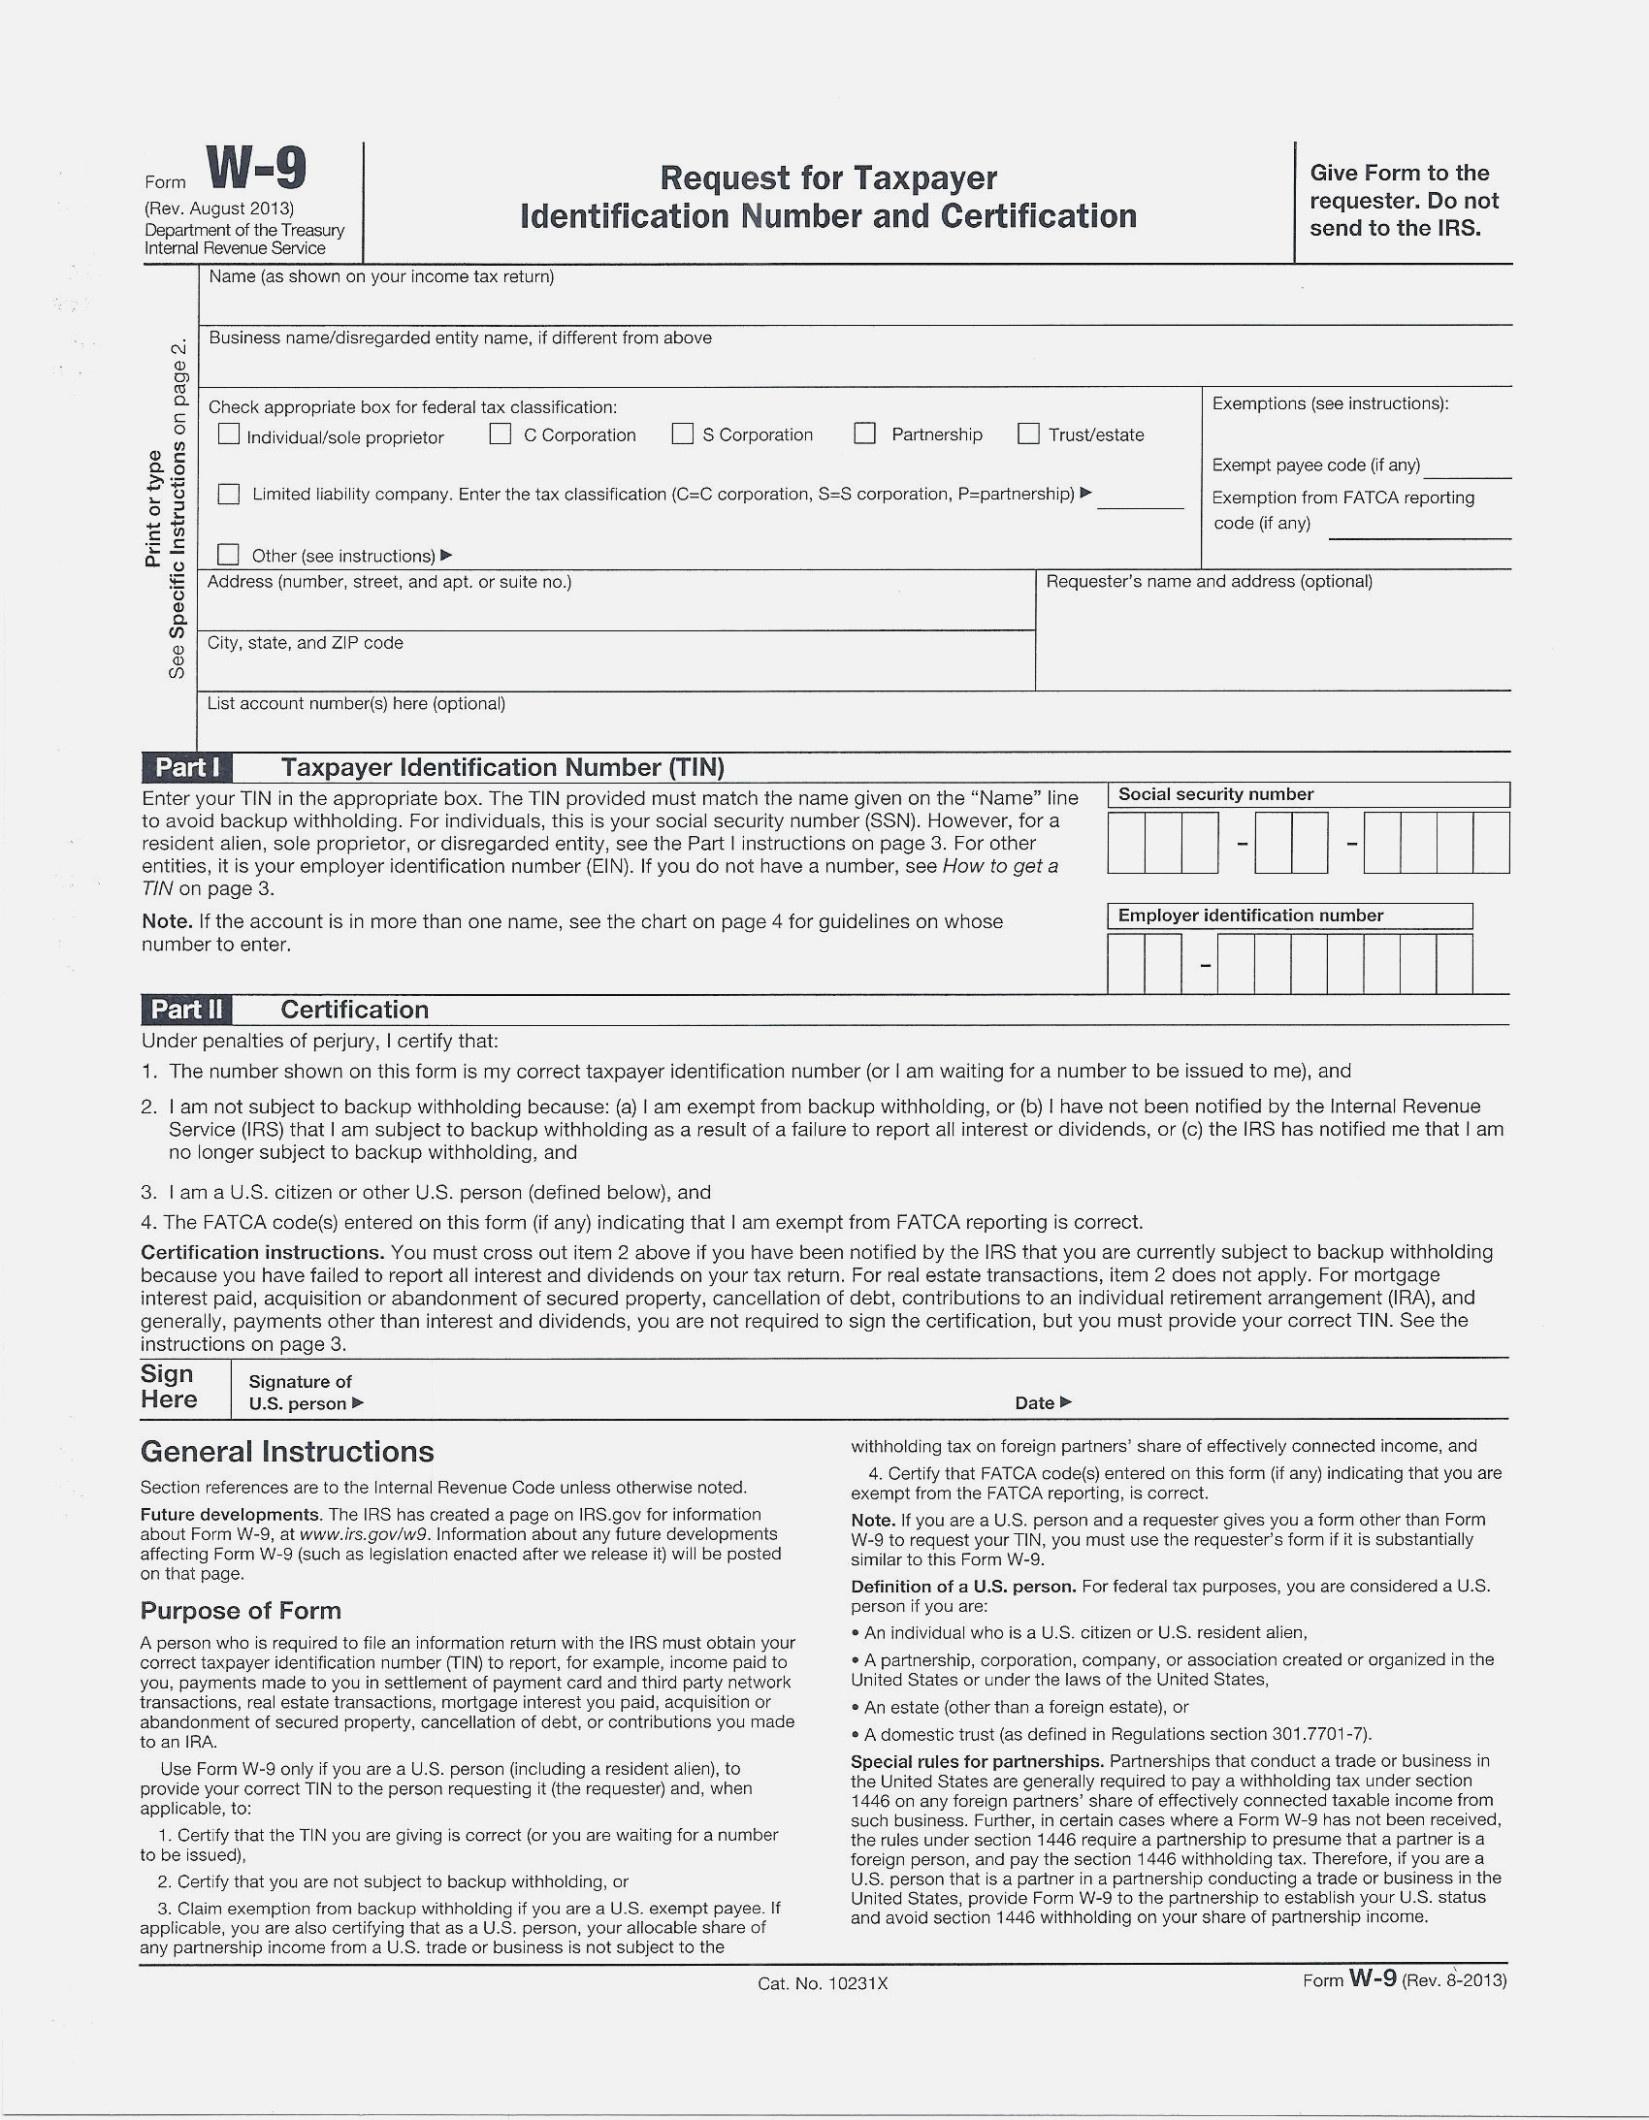 Fresh Free Printable W 14 Form | Downloadtarget – W9 Form Printable - W9 Form Printable 2017 Free